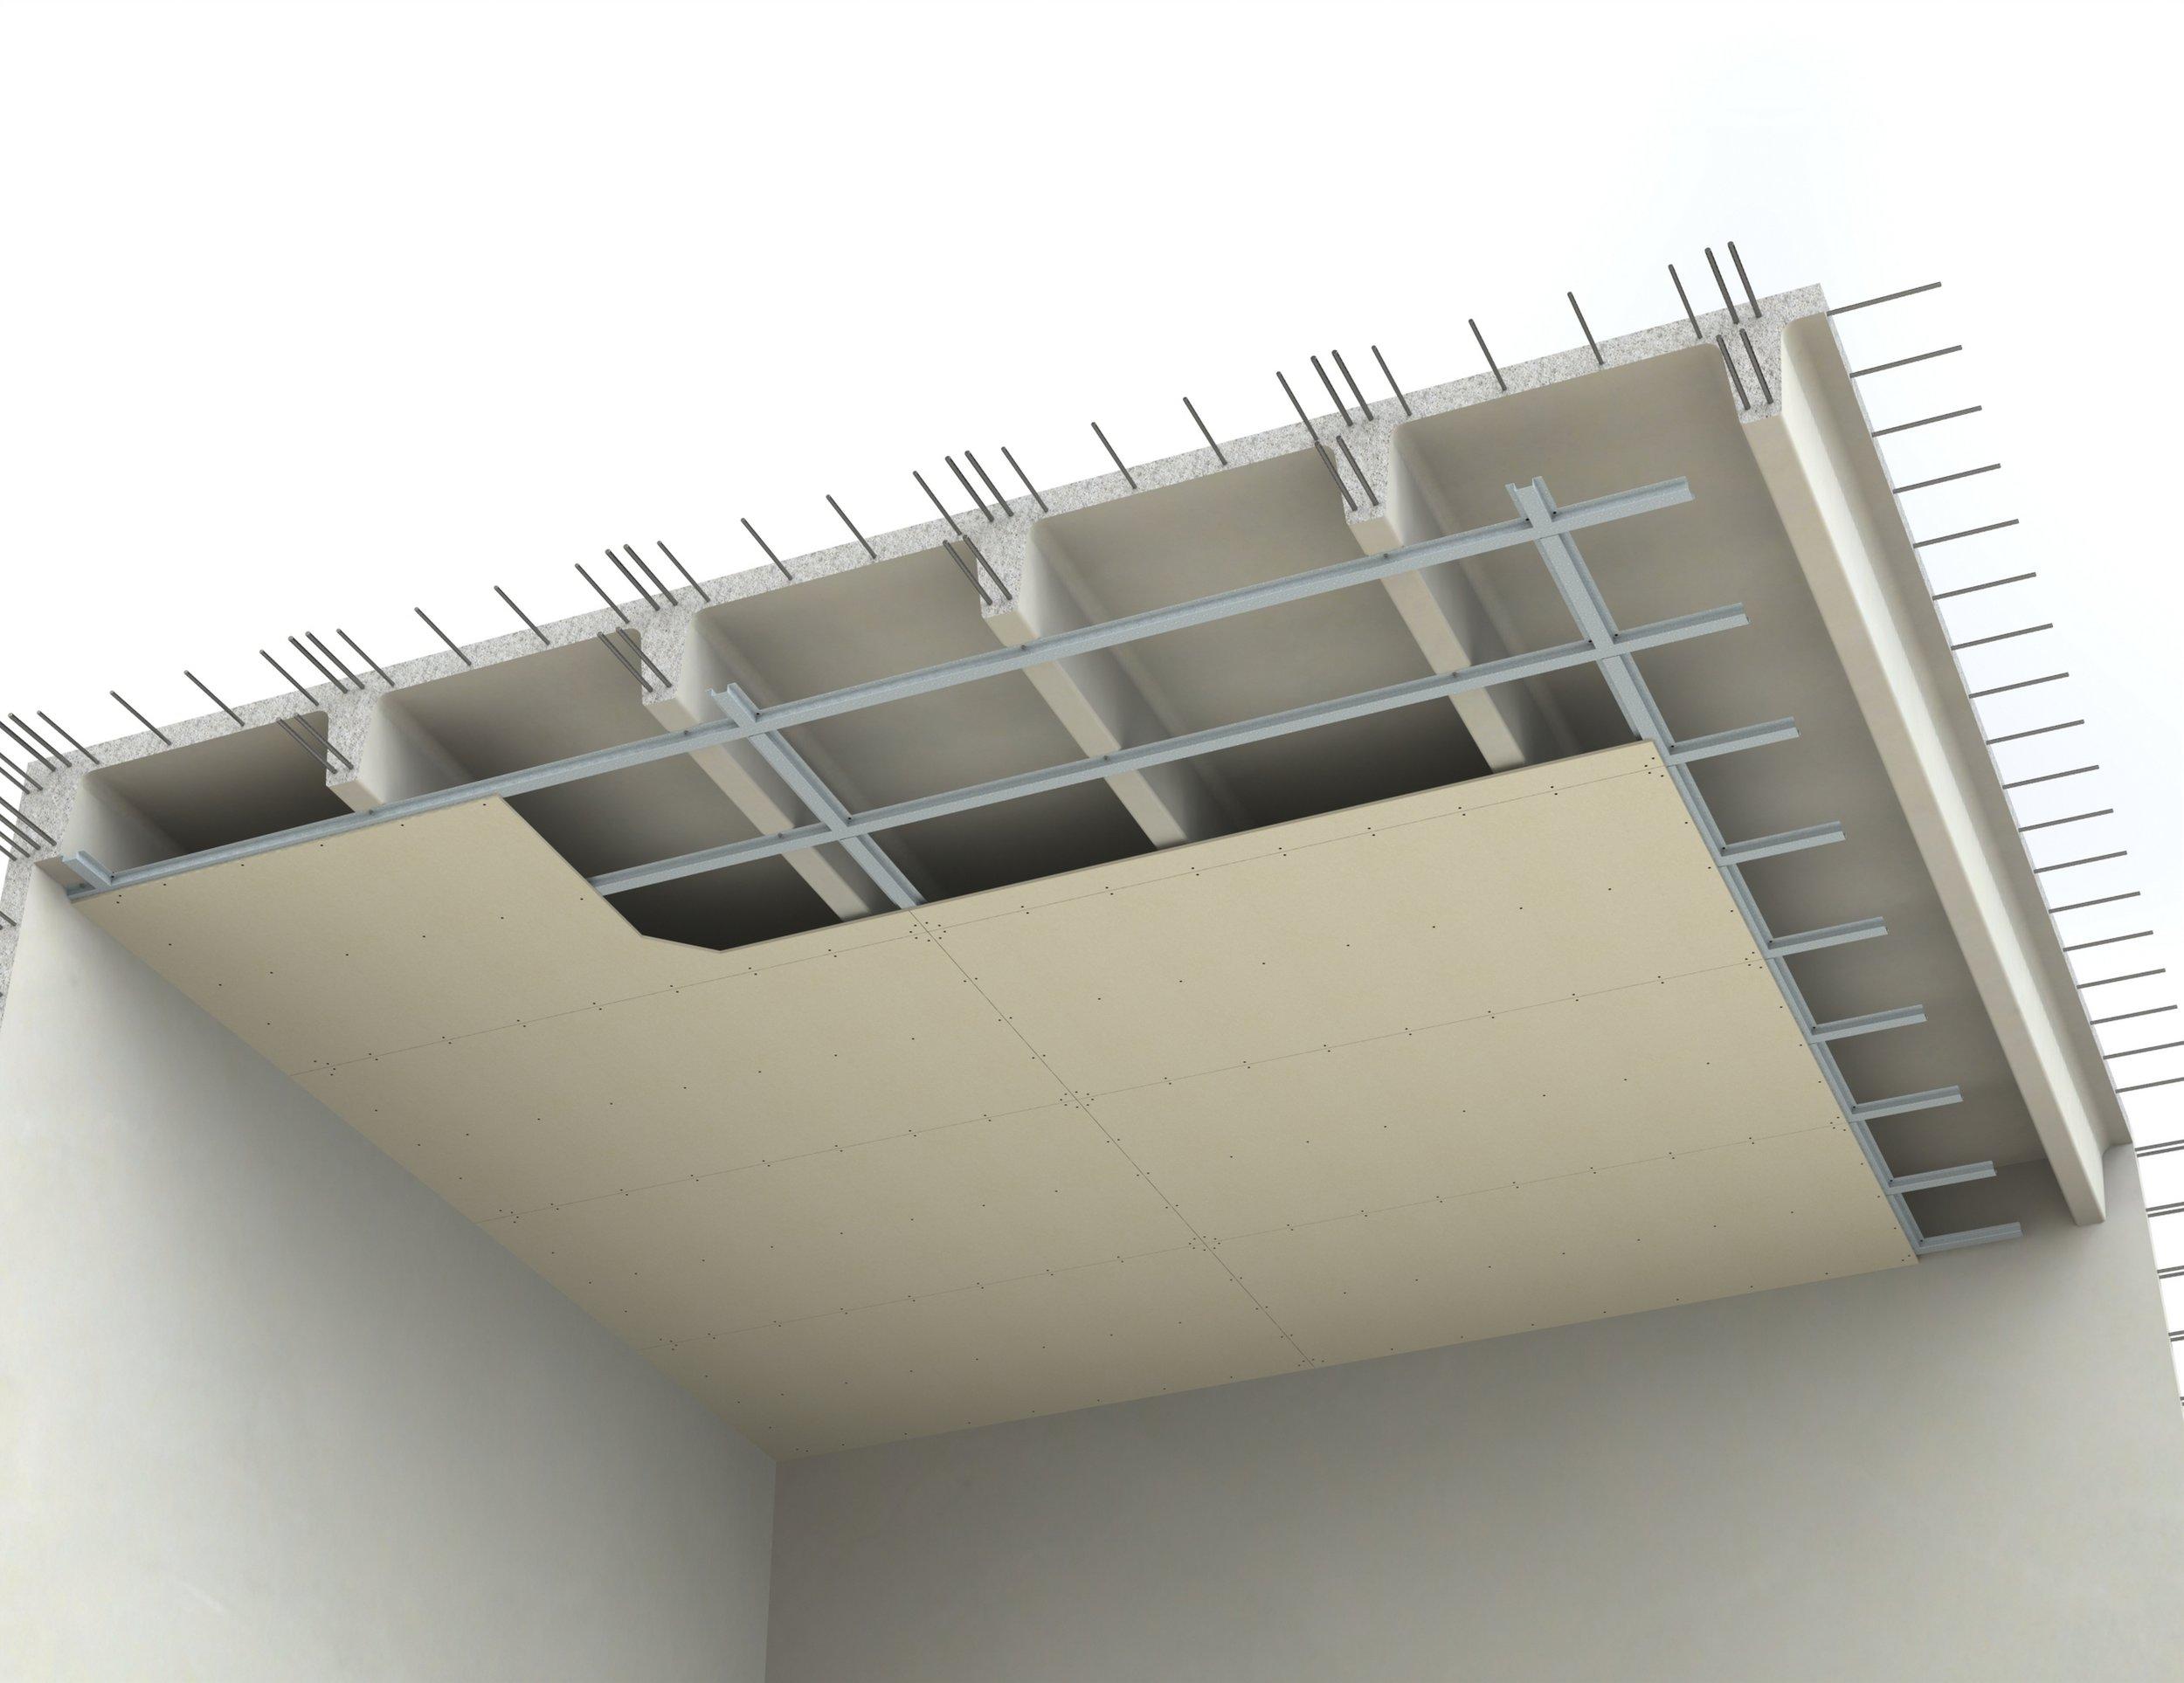 Asse FP60-240 ribbed roof C C3C.JPG